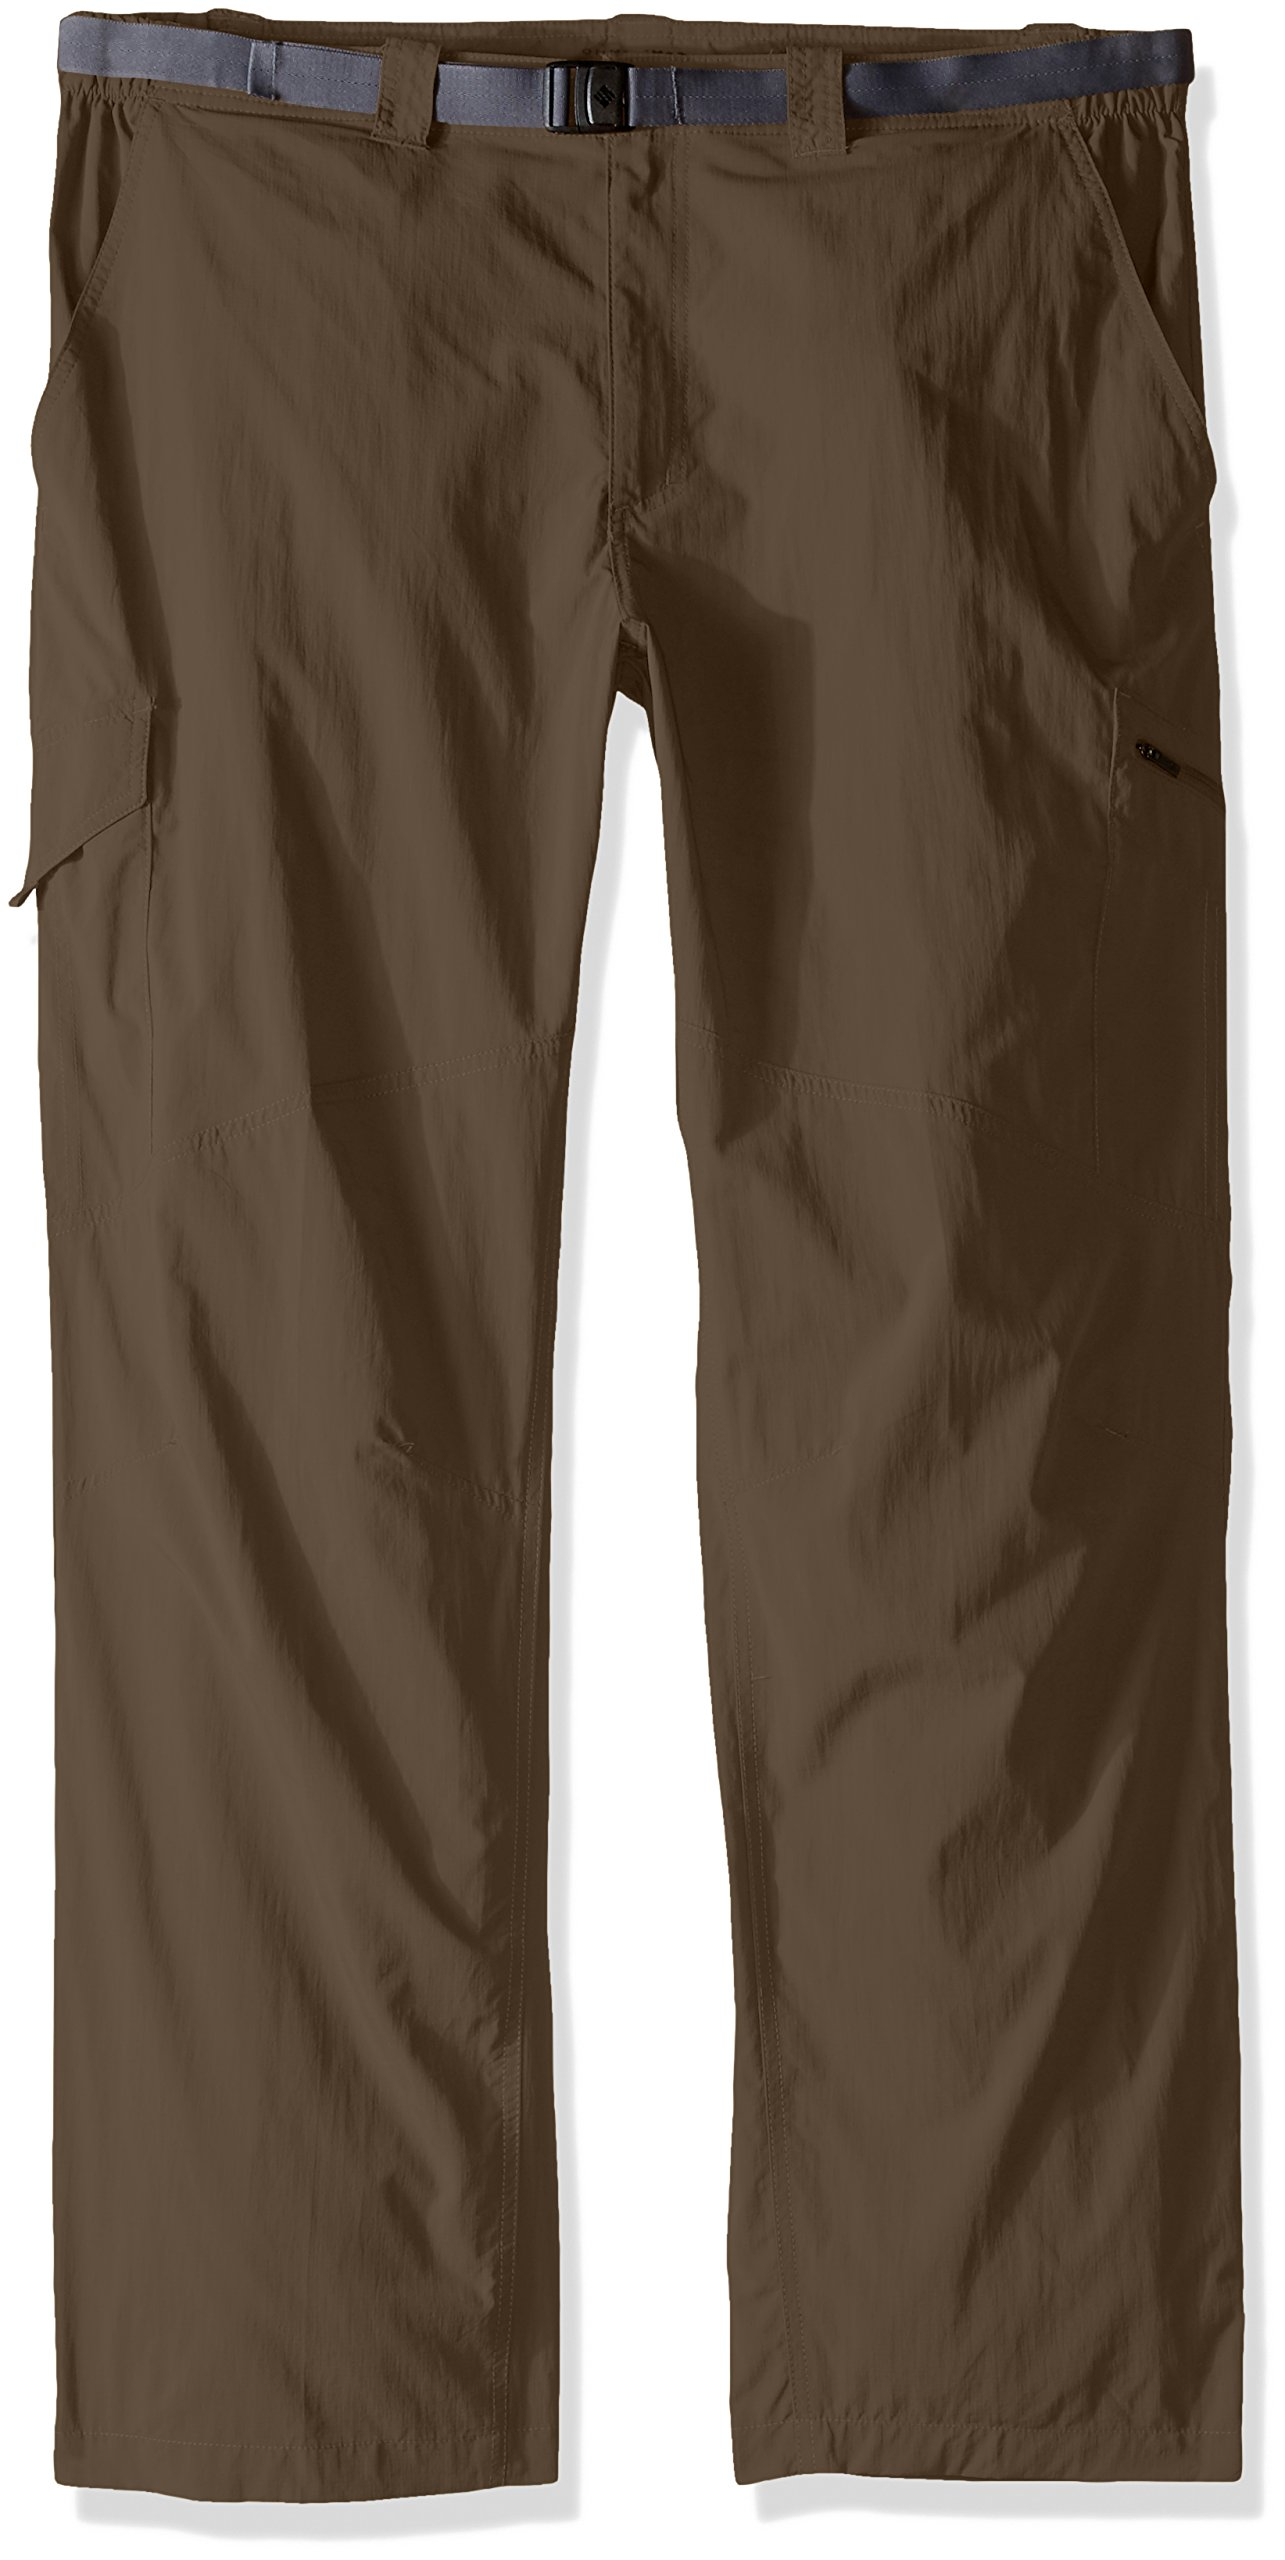 Columbia Silver Ridge Big & Tall Cargo Pant, Major, 50'' x 32'' by Columbia